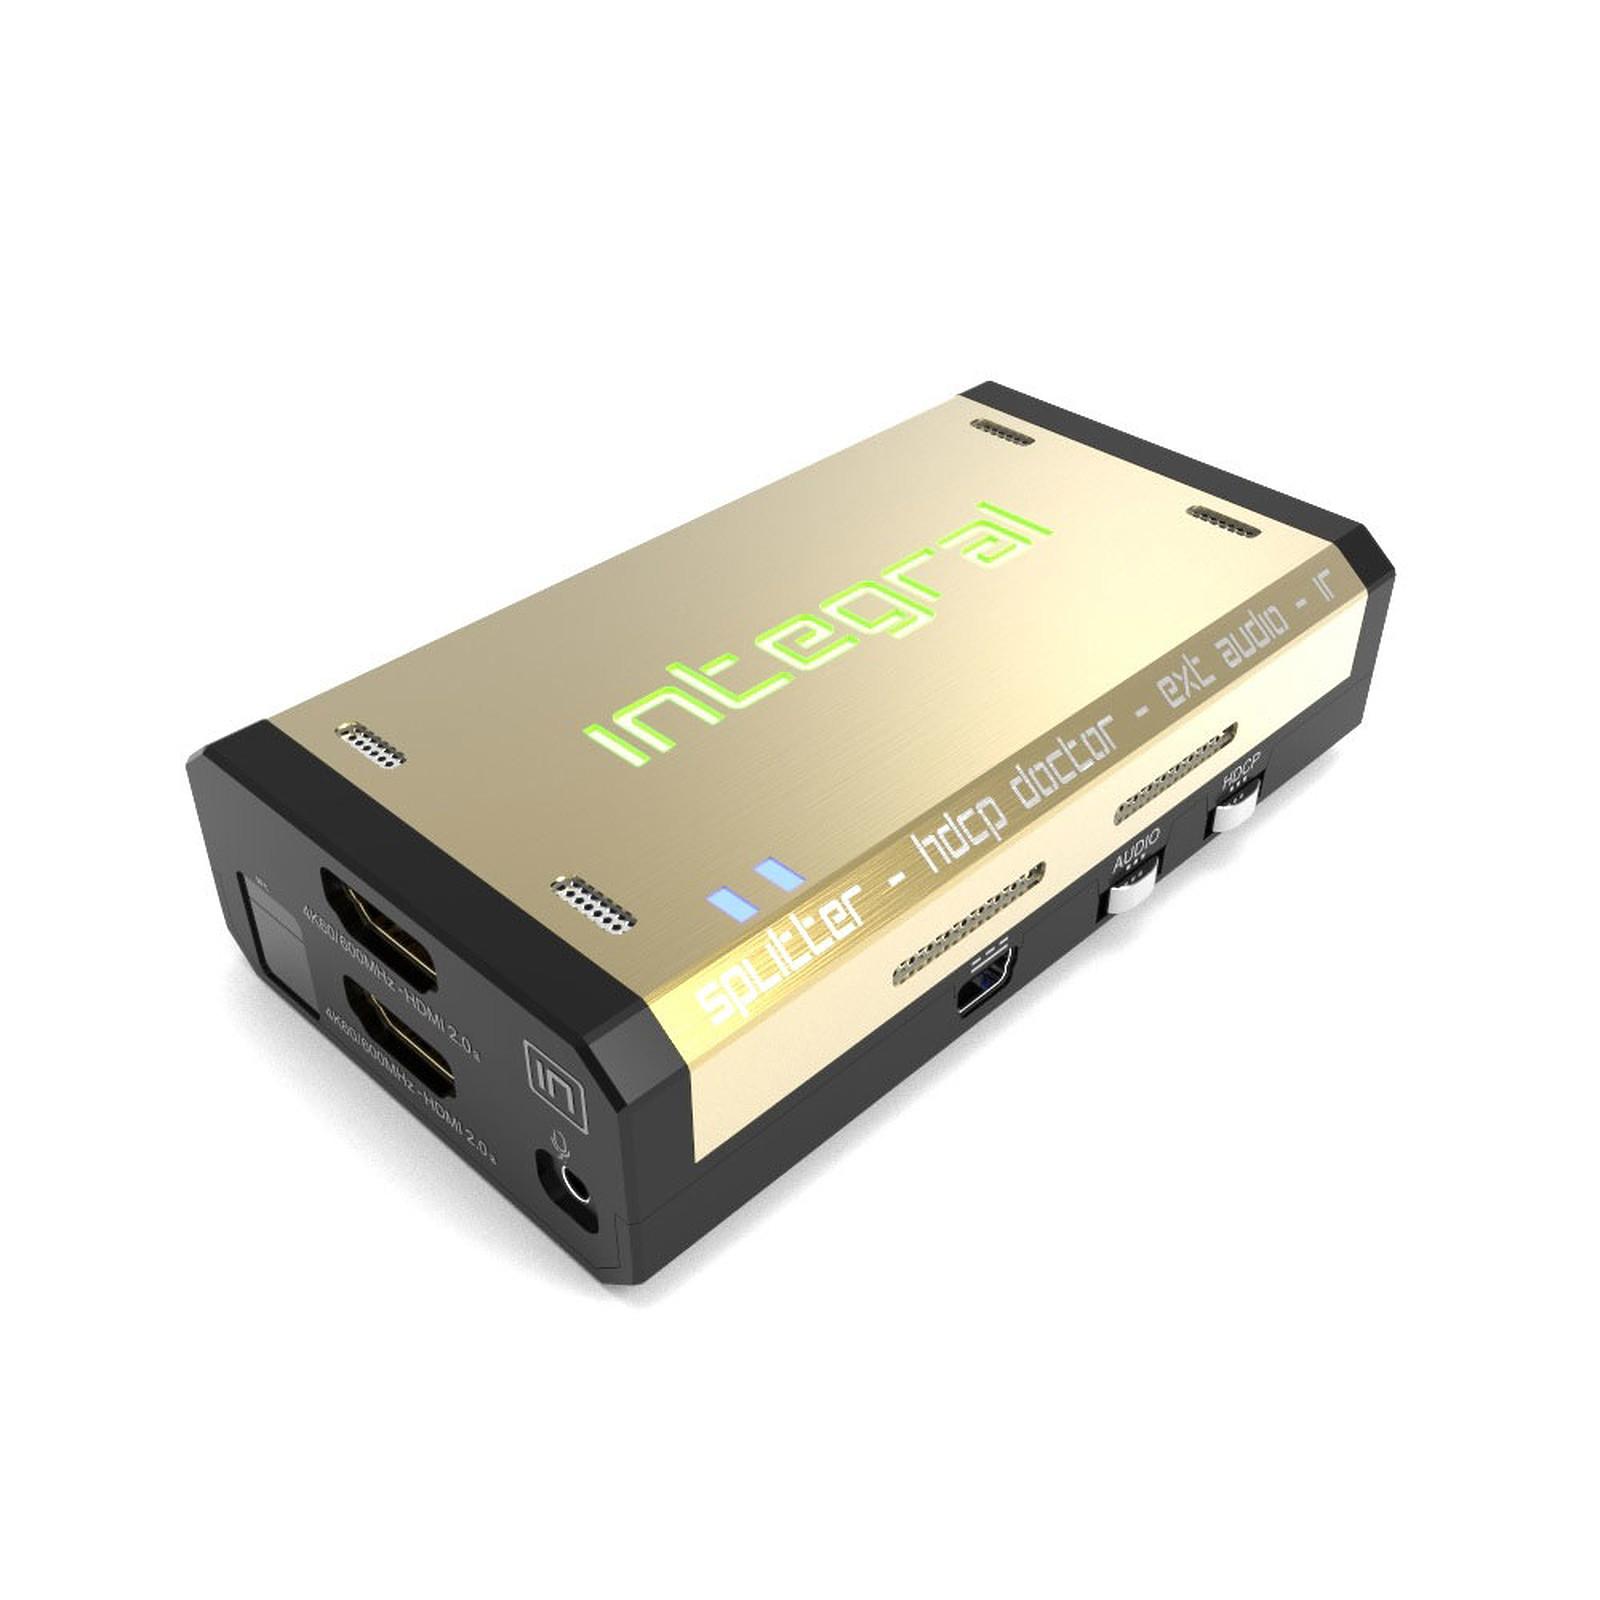 HDfury Integral 4K60 4:4:4 600MHz